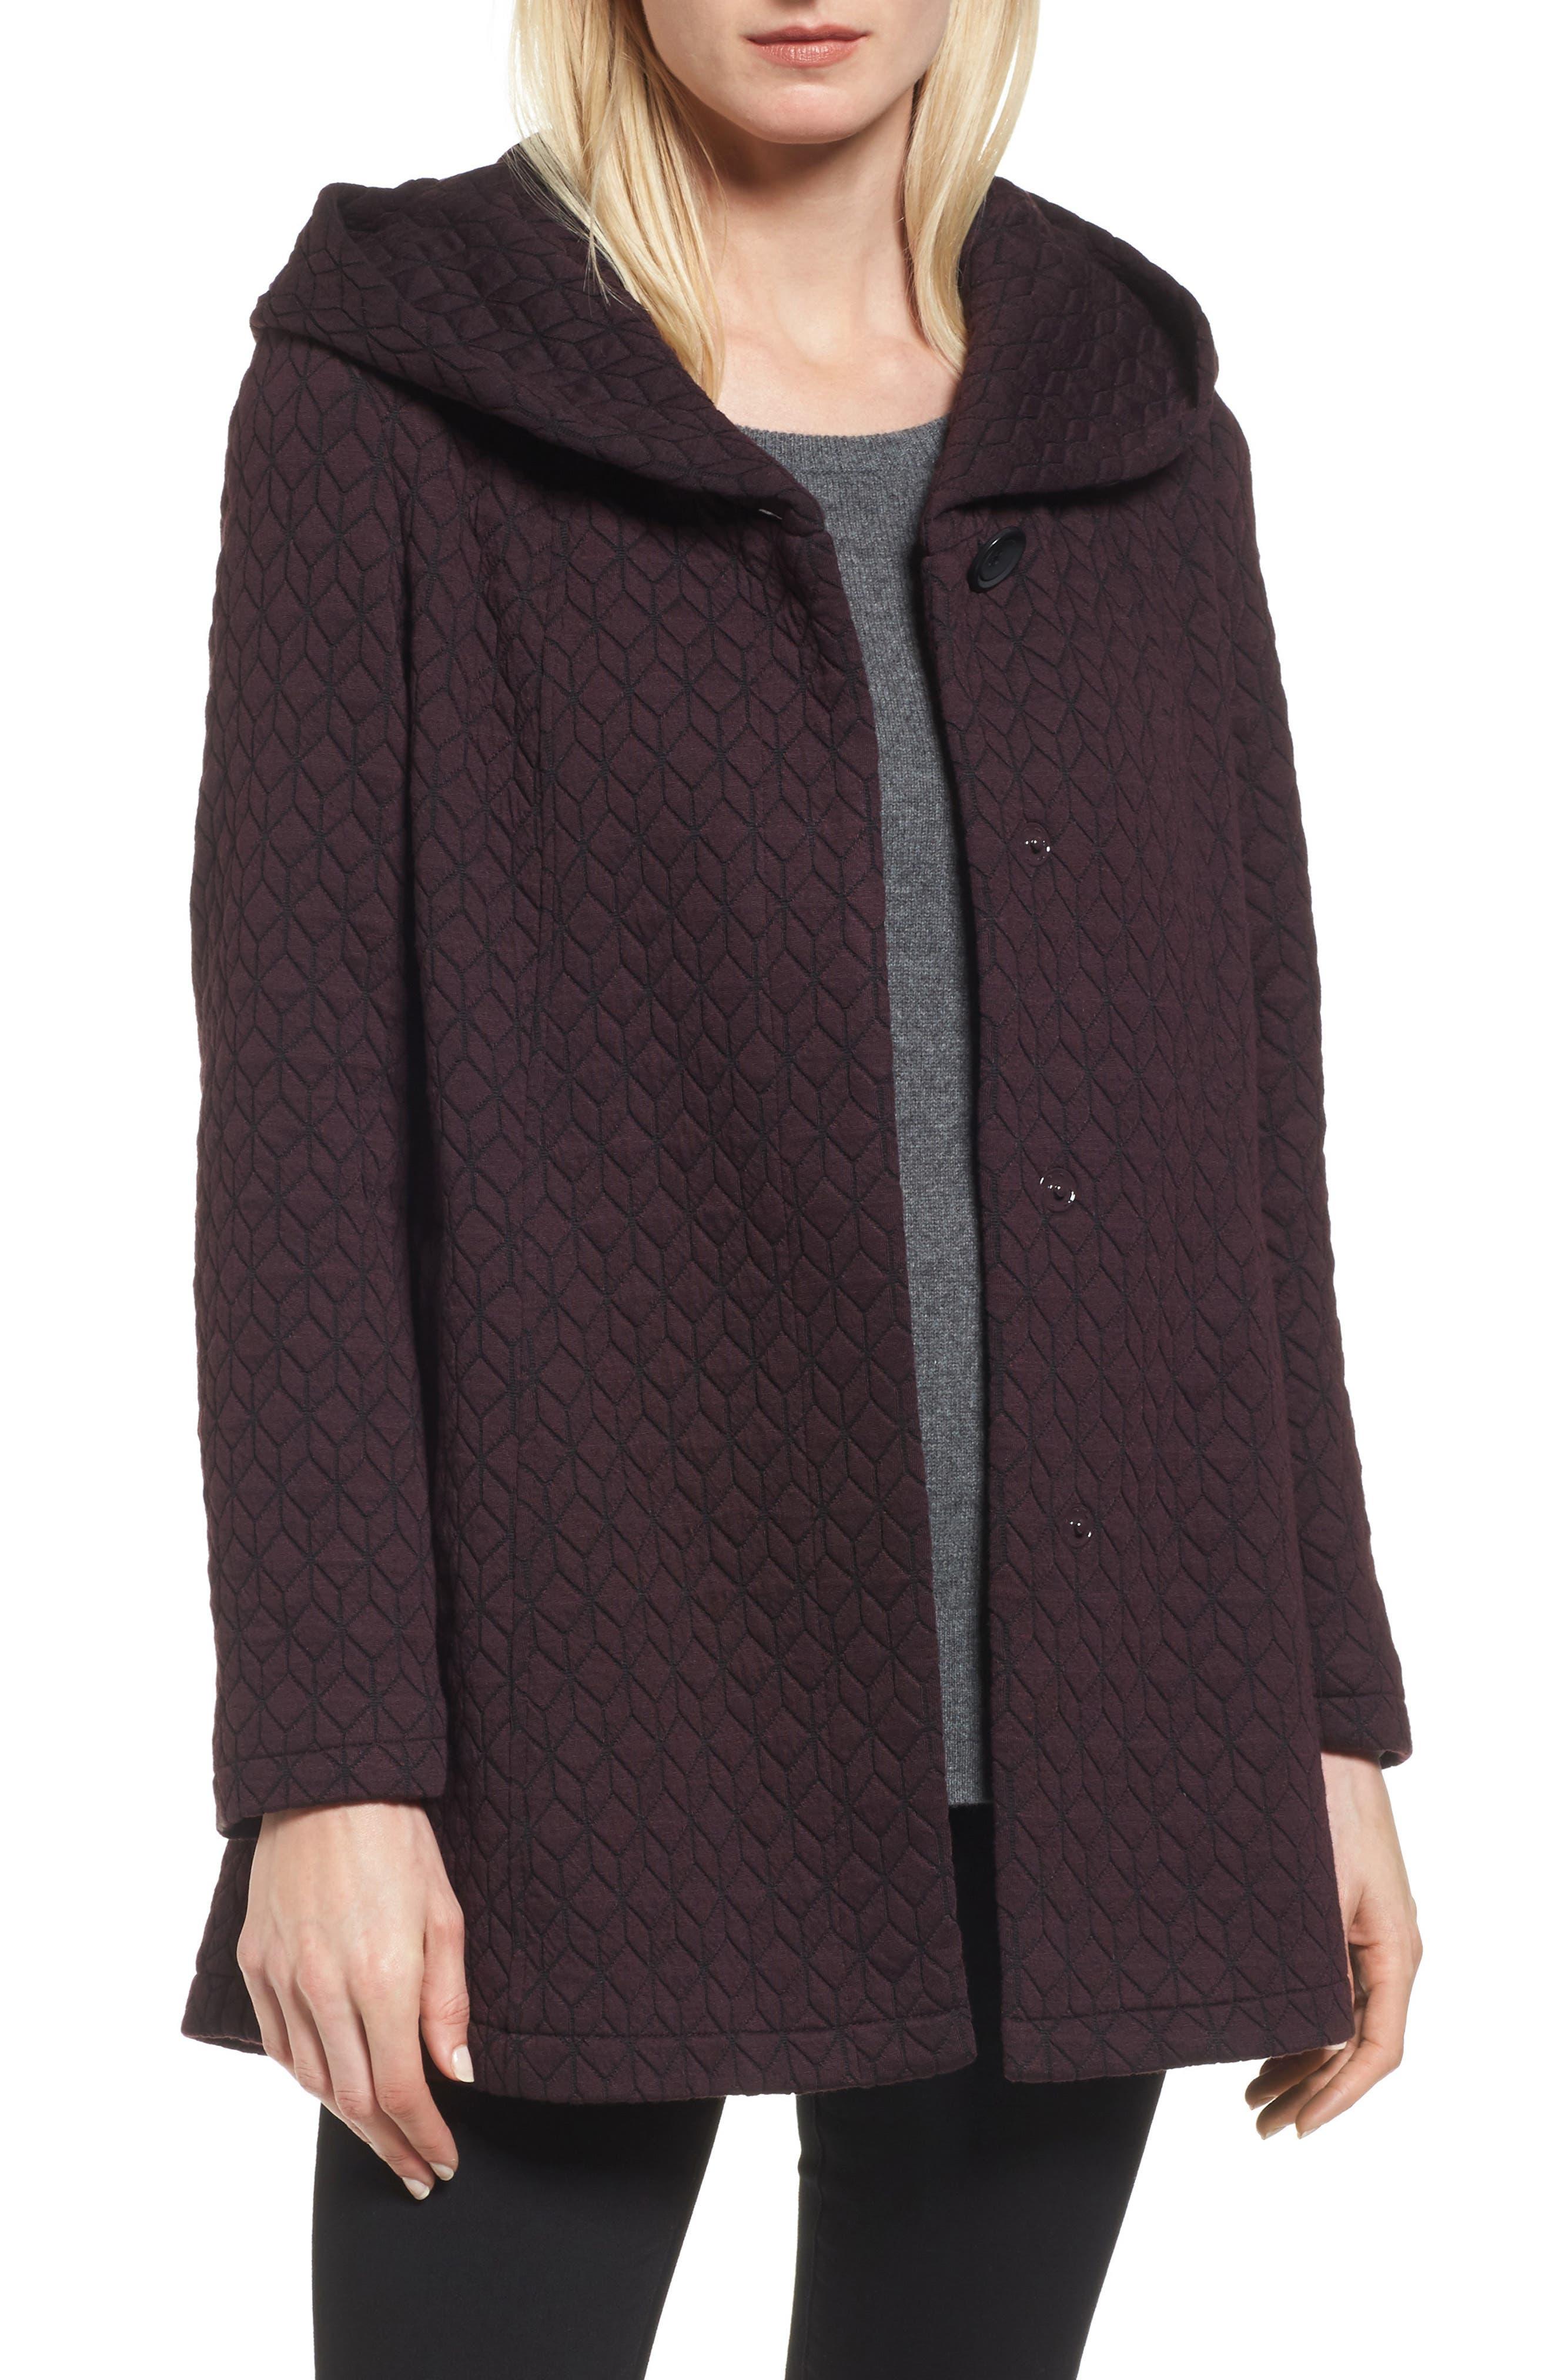 Cozy Knit Coat,                             Main thumbnail 1, color,                             Burgundy